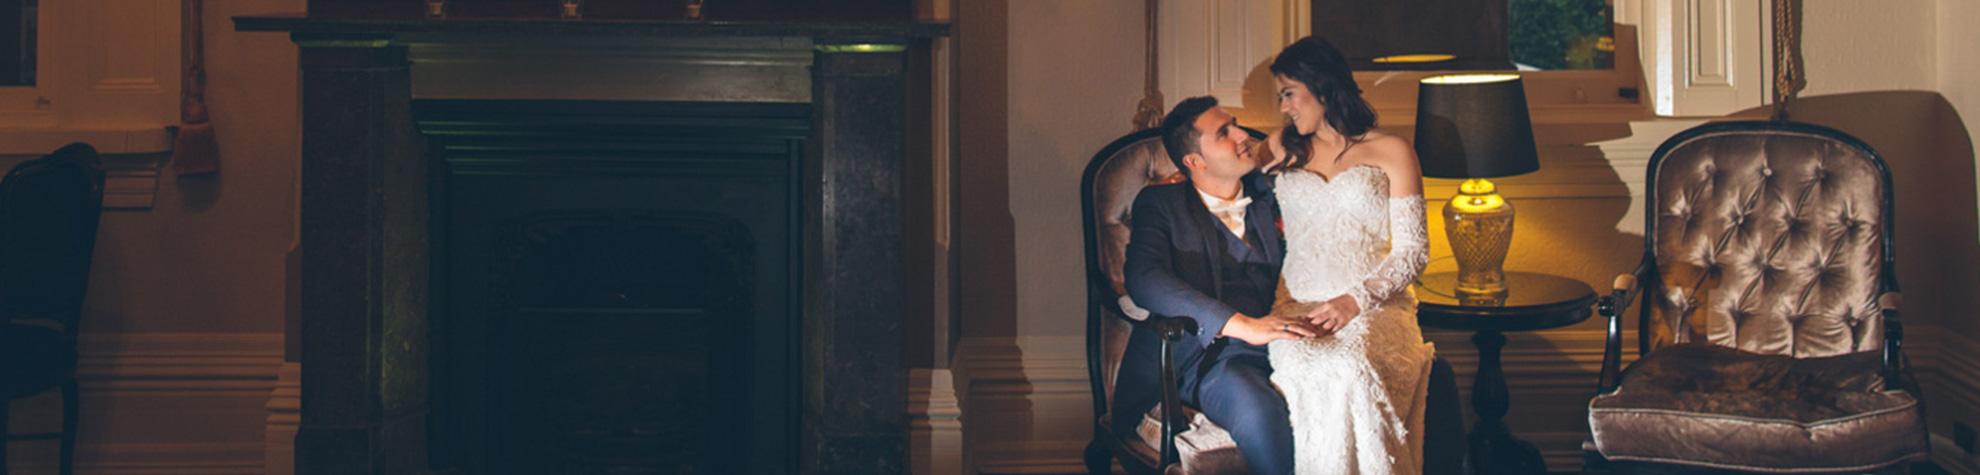 Dan & Daniela – Wedding Photos – Curzon Hall – St Charles Ryde